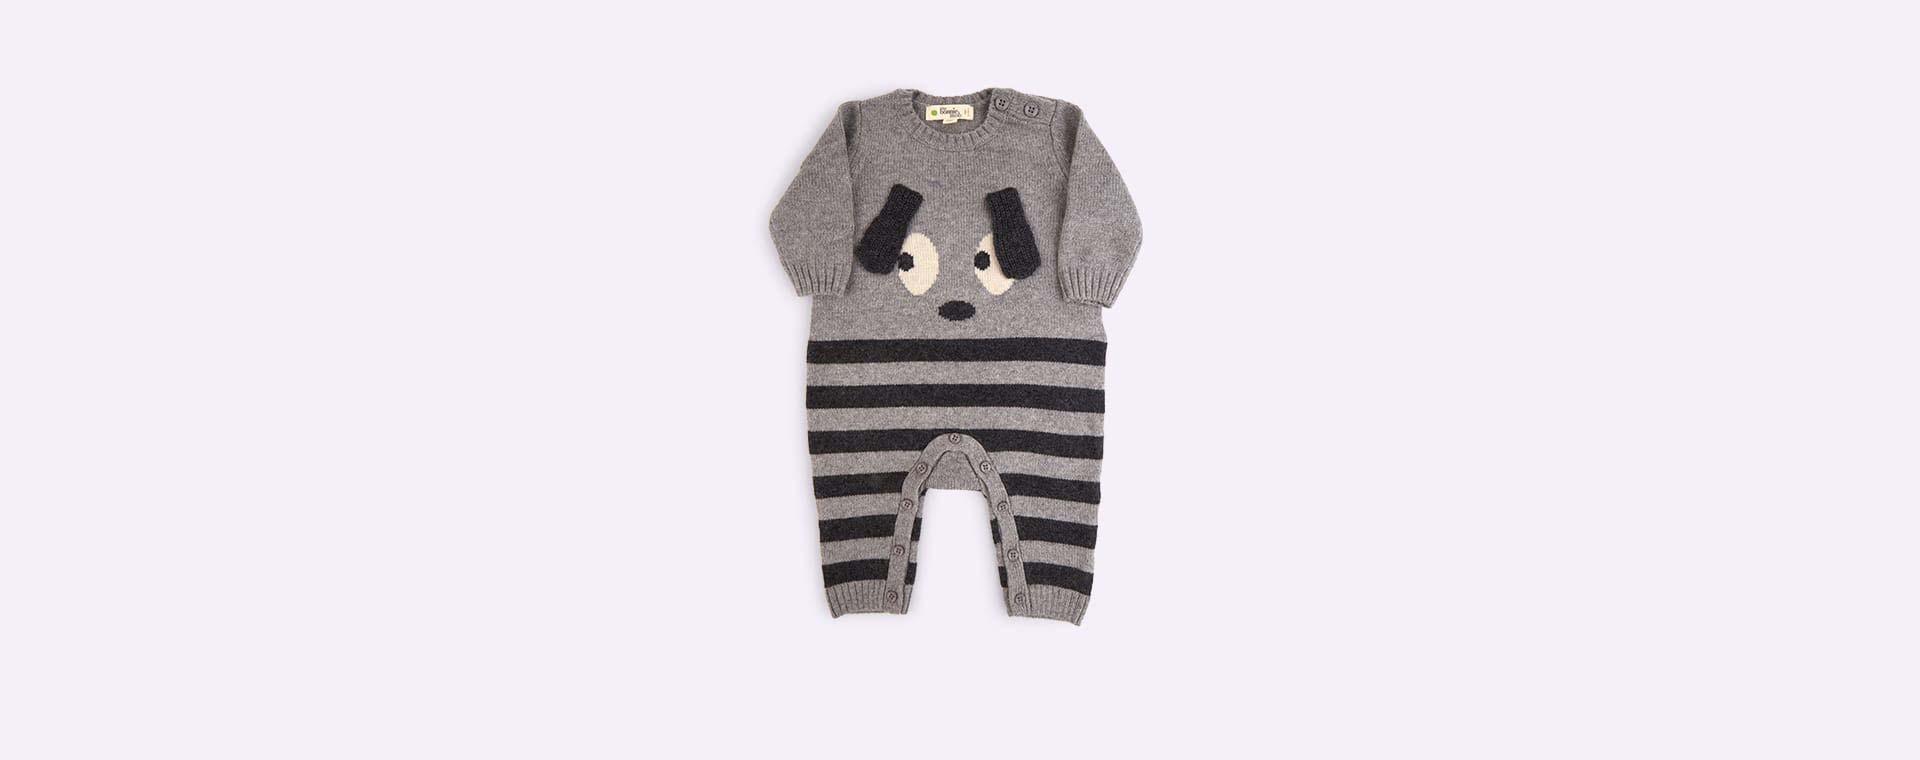 Grey The Bonnie Mob Roxy Bunny Ears Baby Playsuit